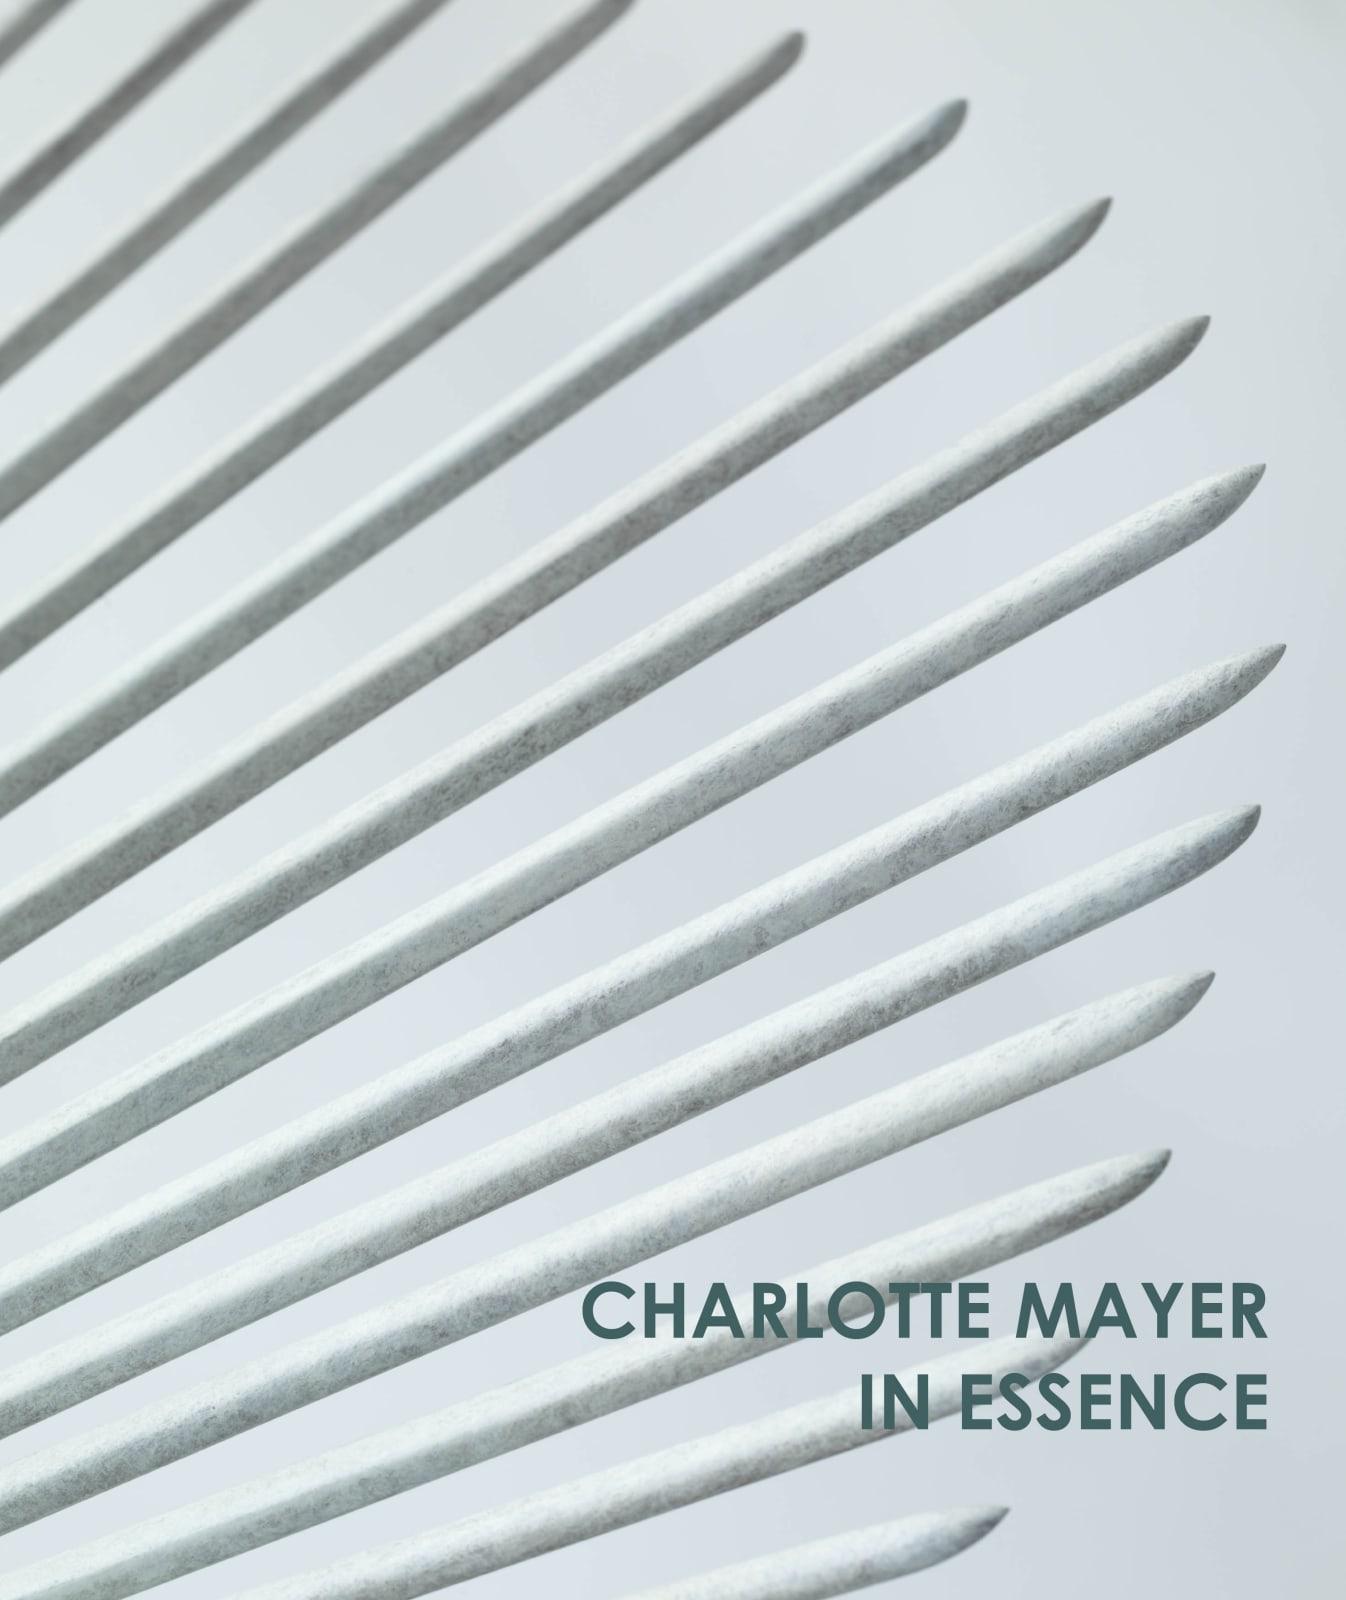 Charlotte Mayer In Essence